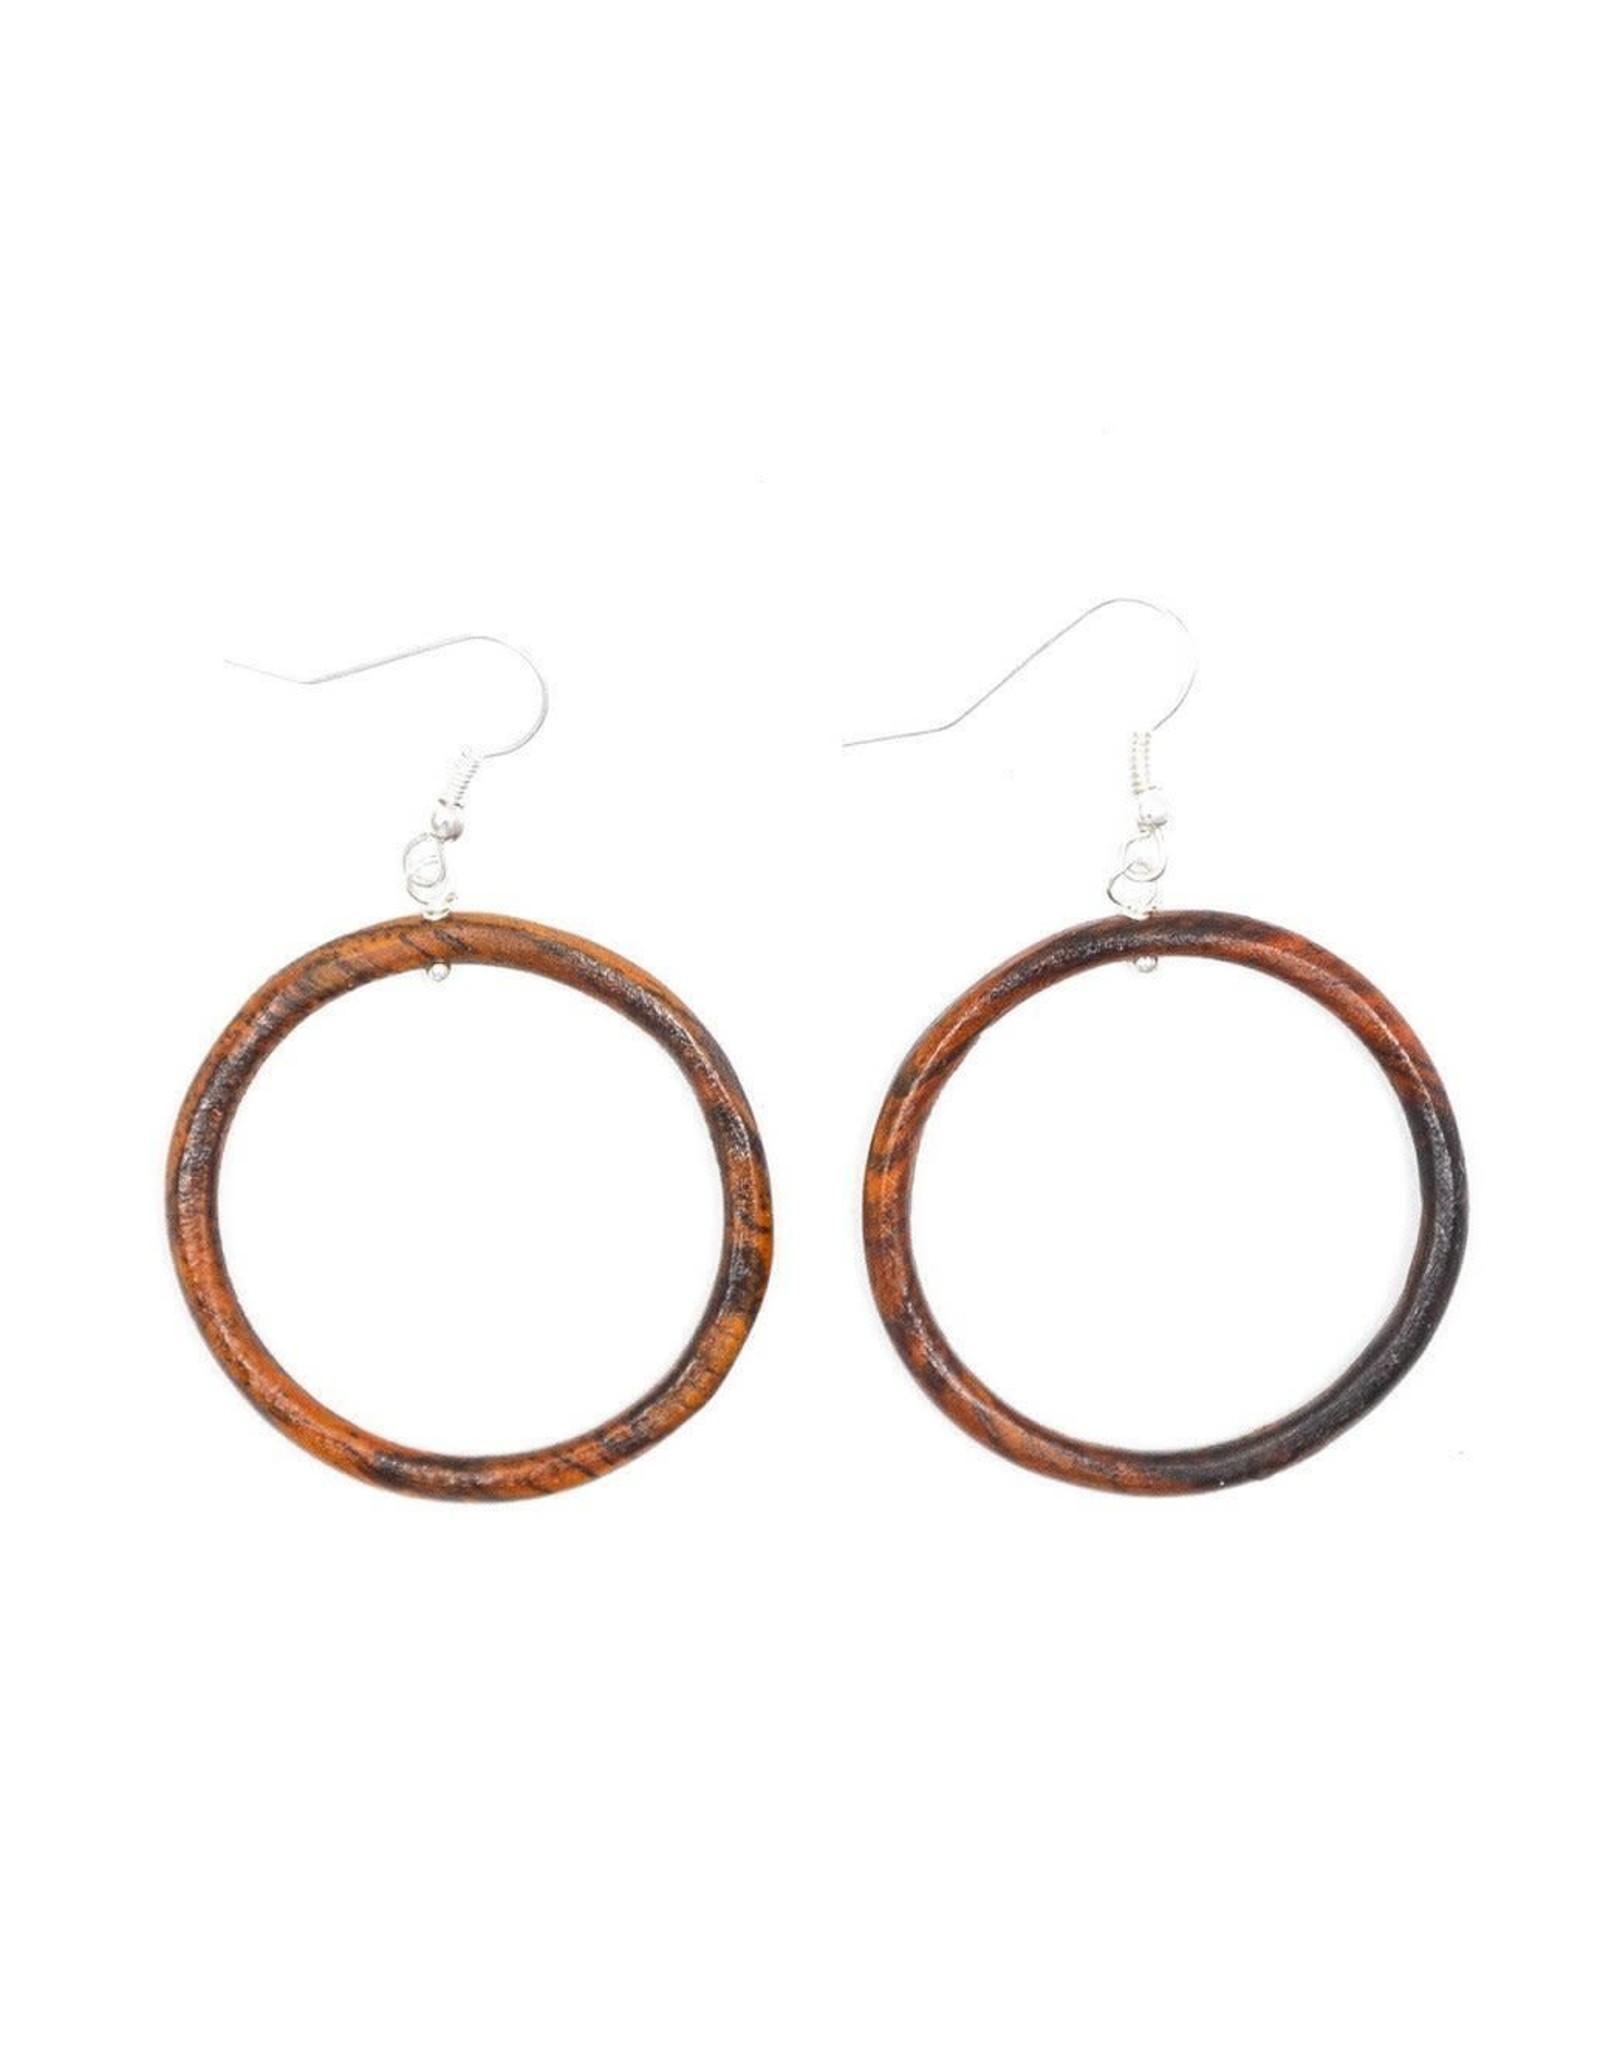 Wood Round Earrings, Guatemala